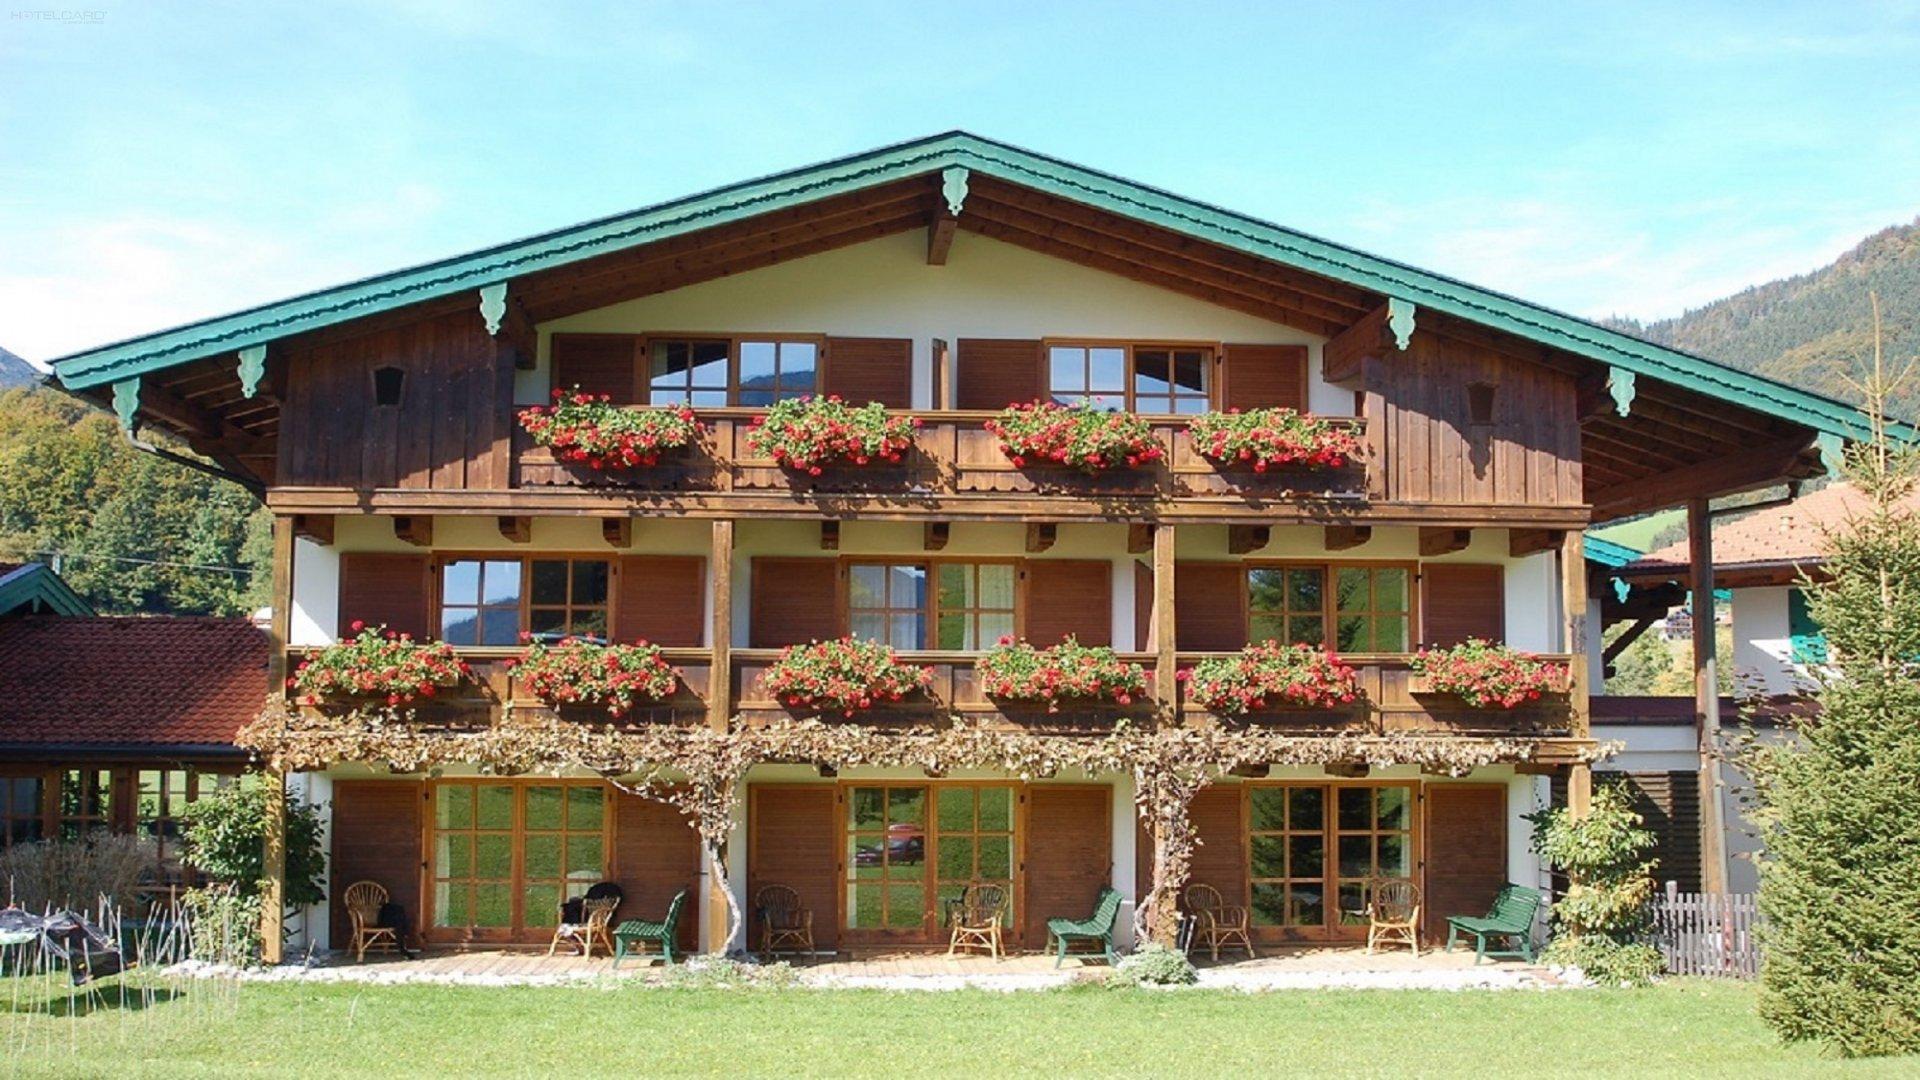 Landhotel Maiergschwendt by DEVA 27